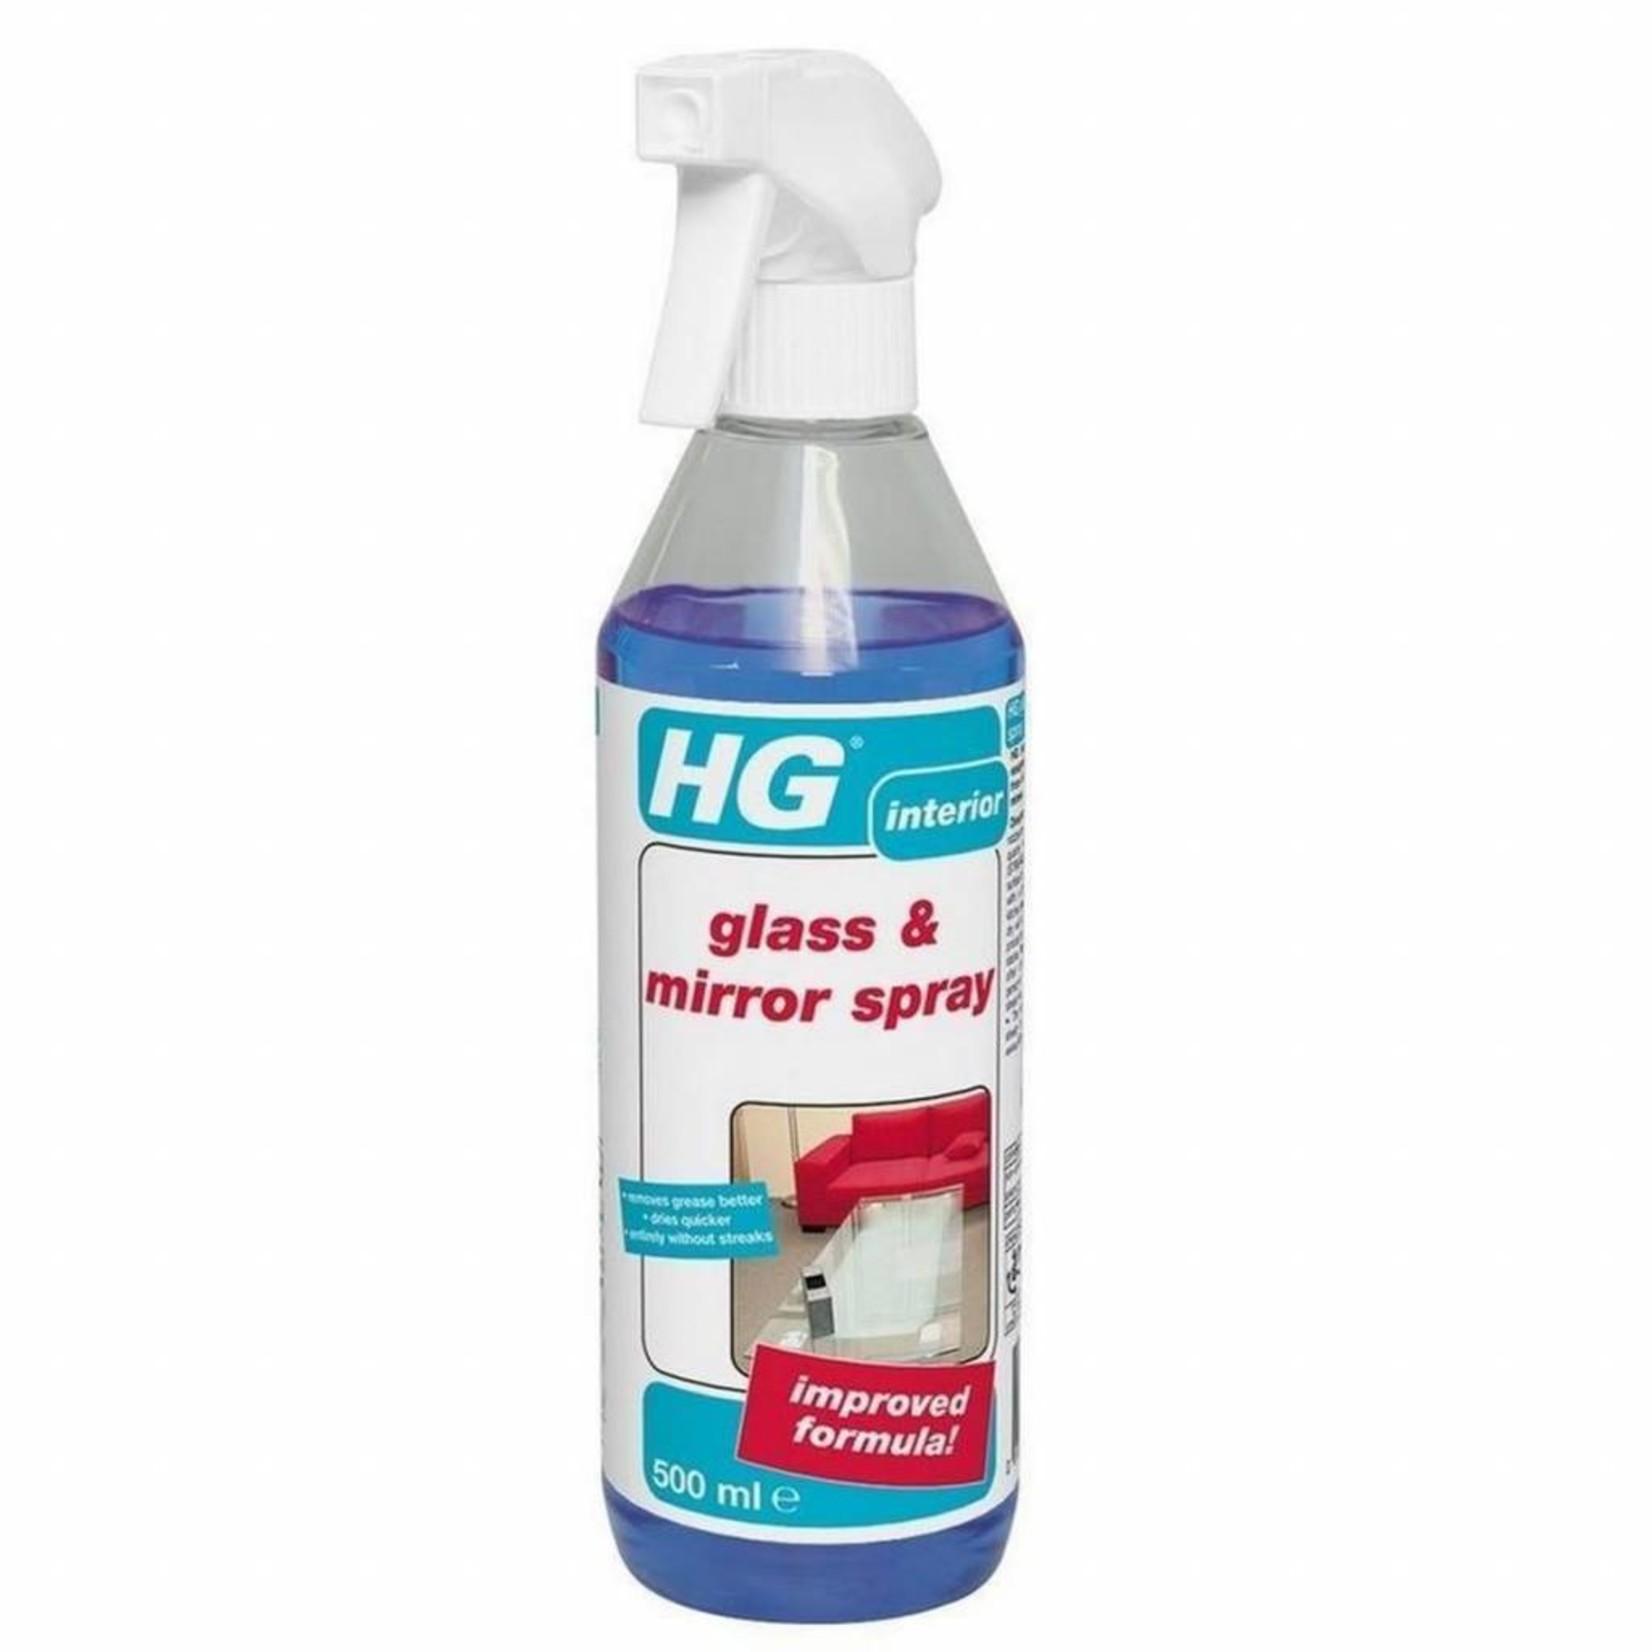 HG HG GLASS & MIRROR SPRAY INTERIOR